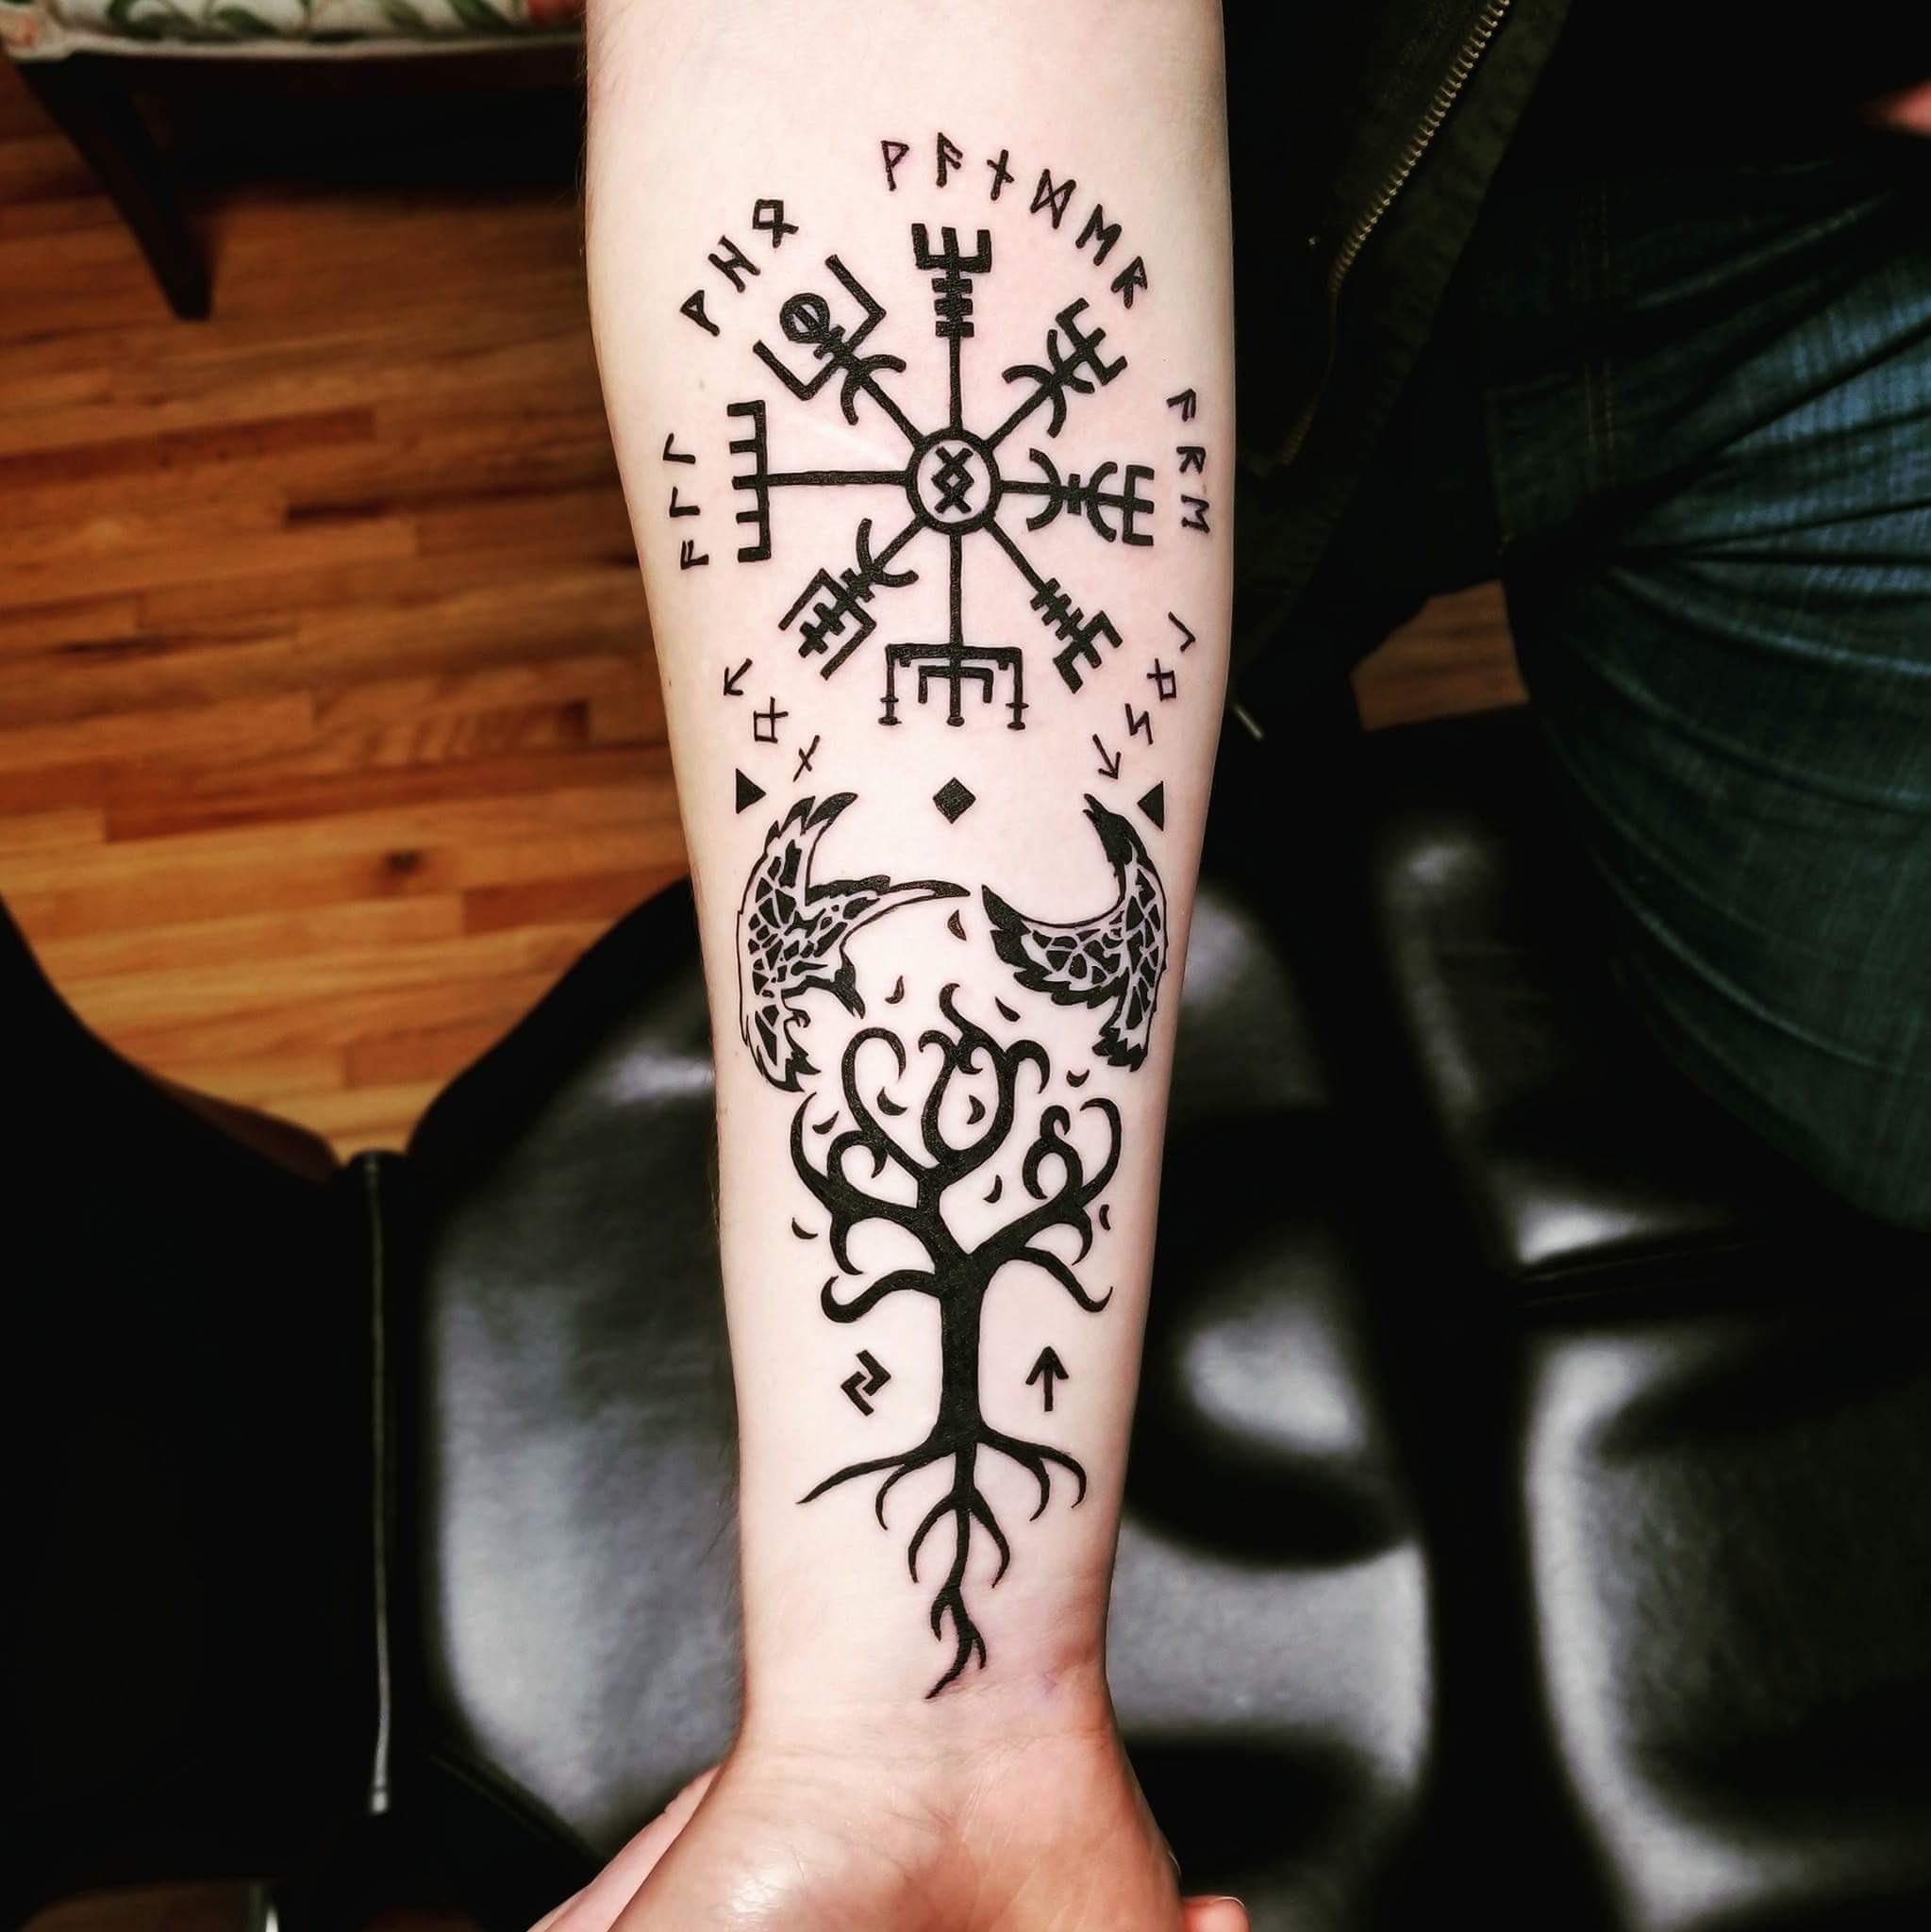 Bref, un symbole trop cool à se tatouer. Norse Tattoos Norsk 2020